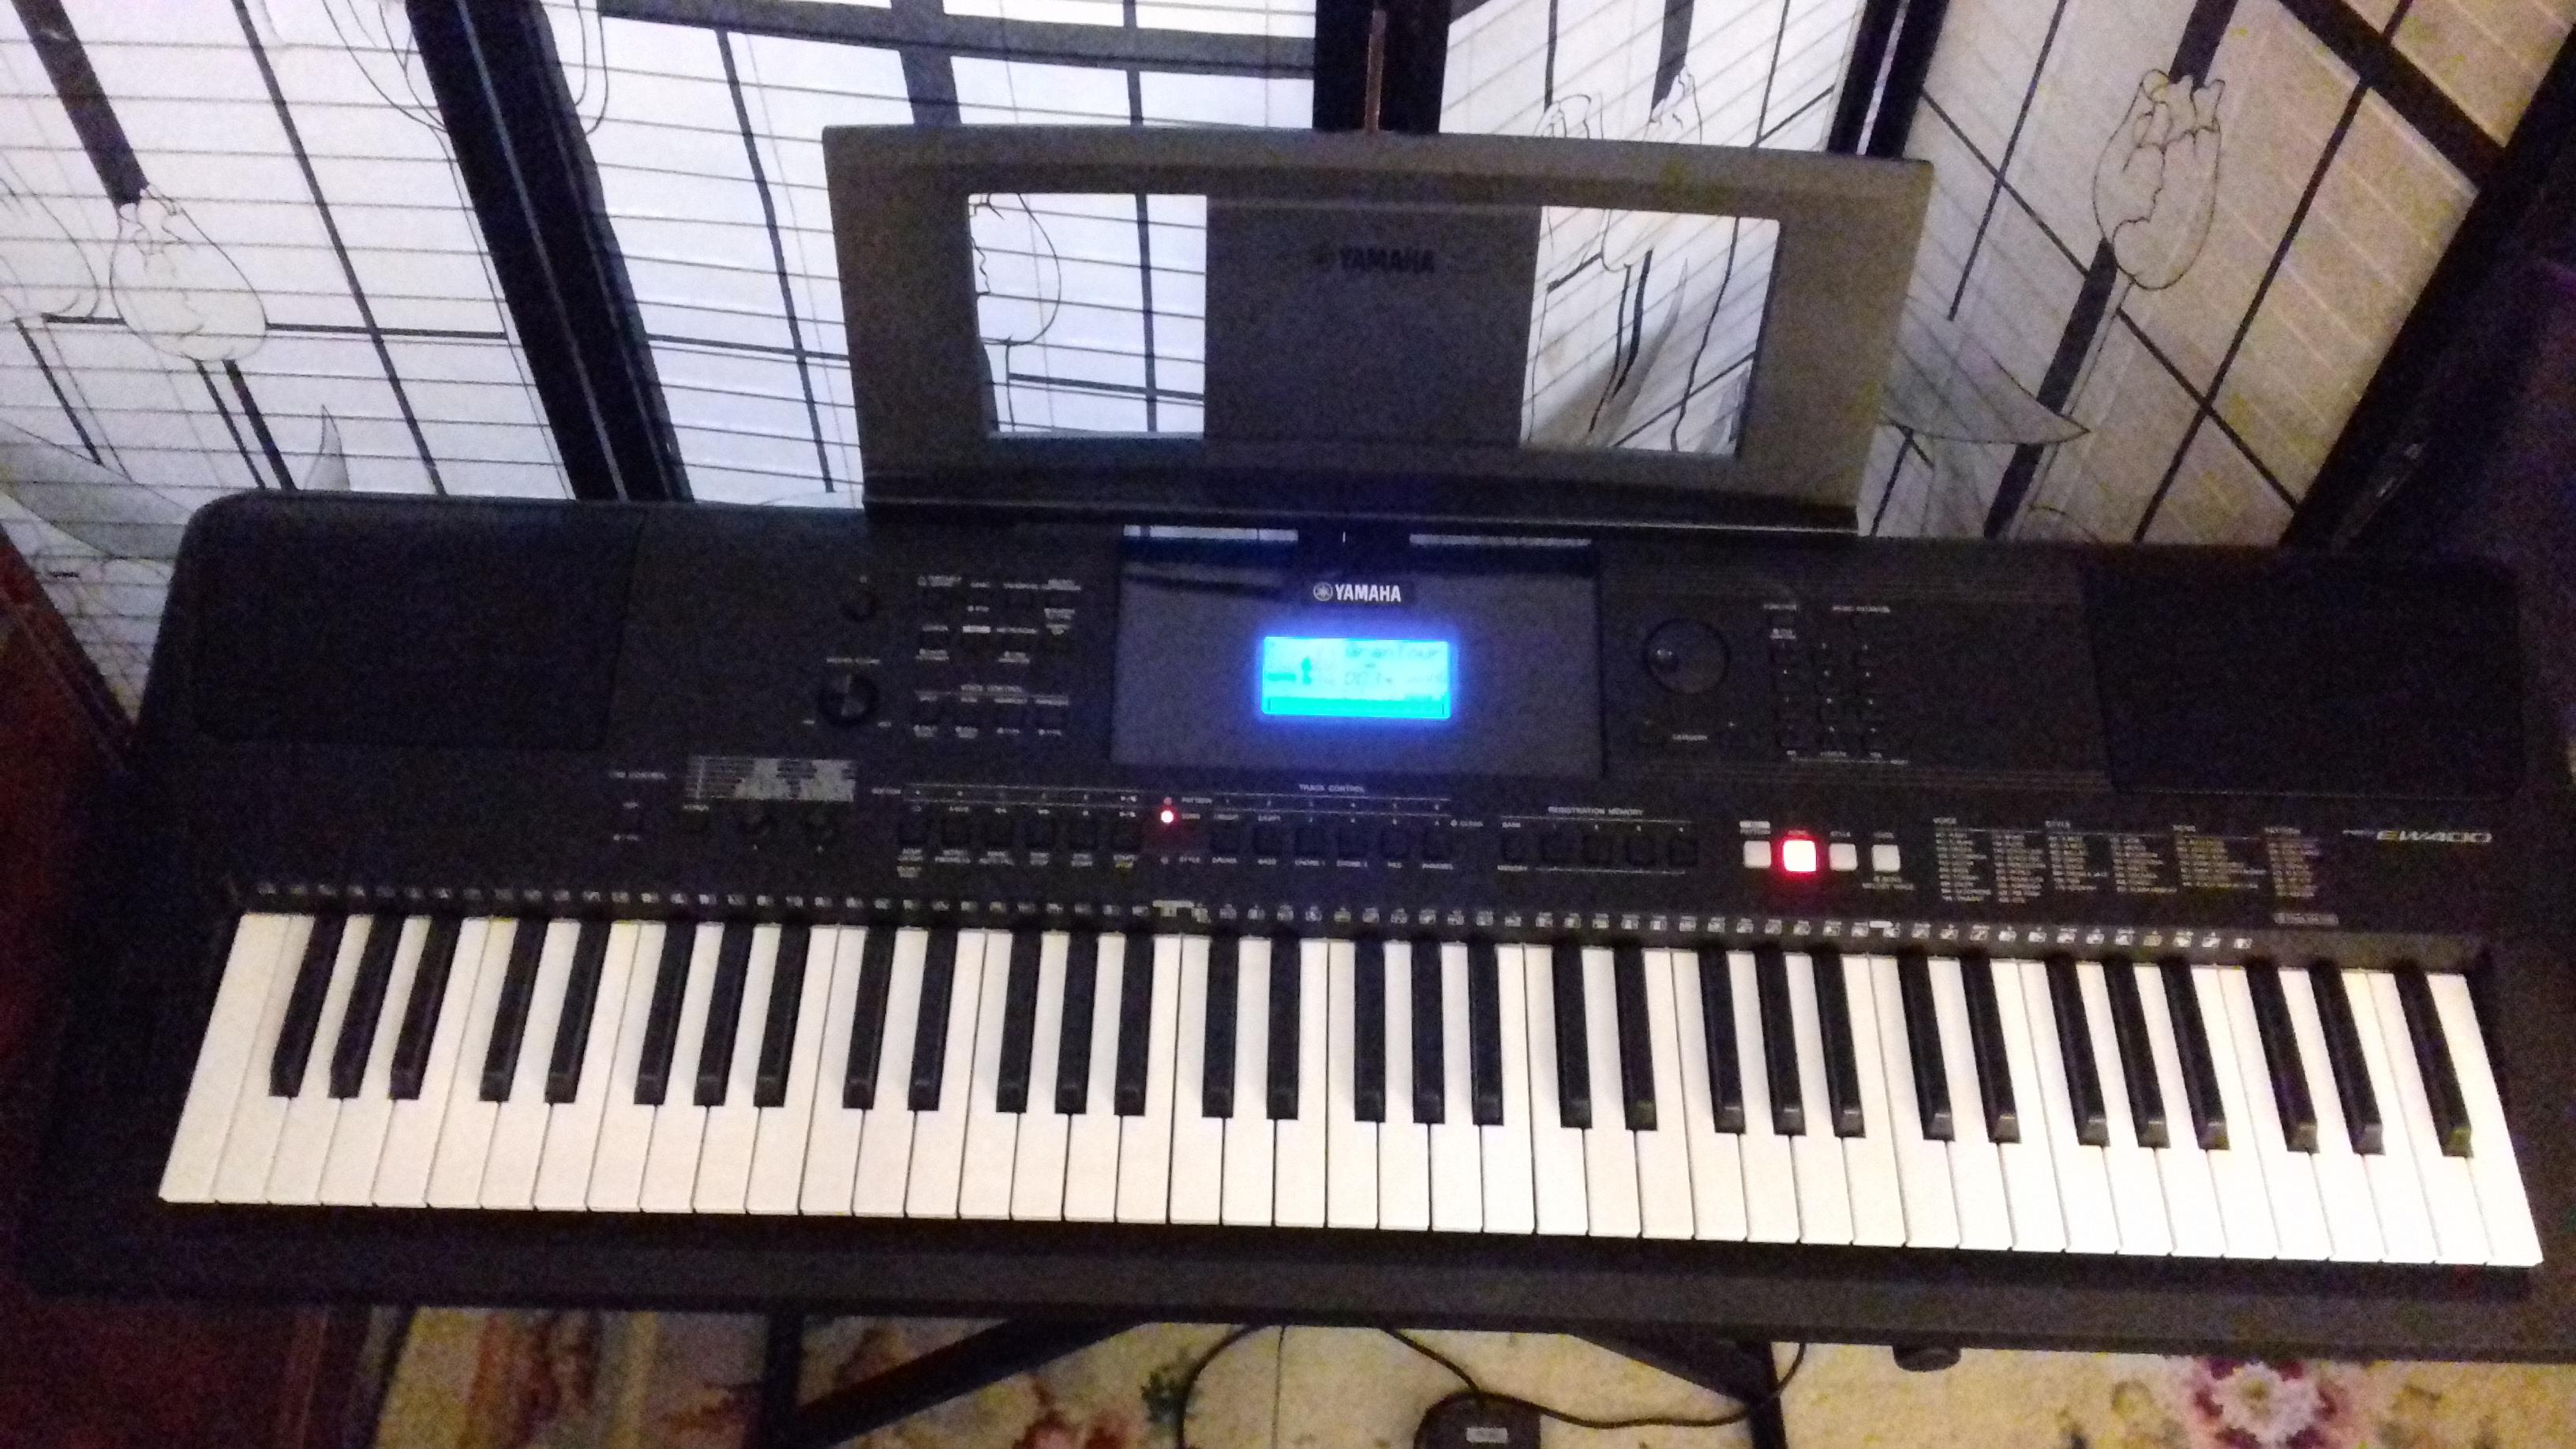 Elpiano_DPS-1200_piano_numerique_2.jpg